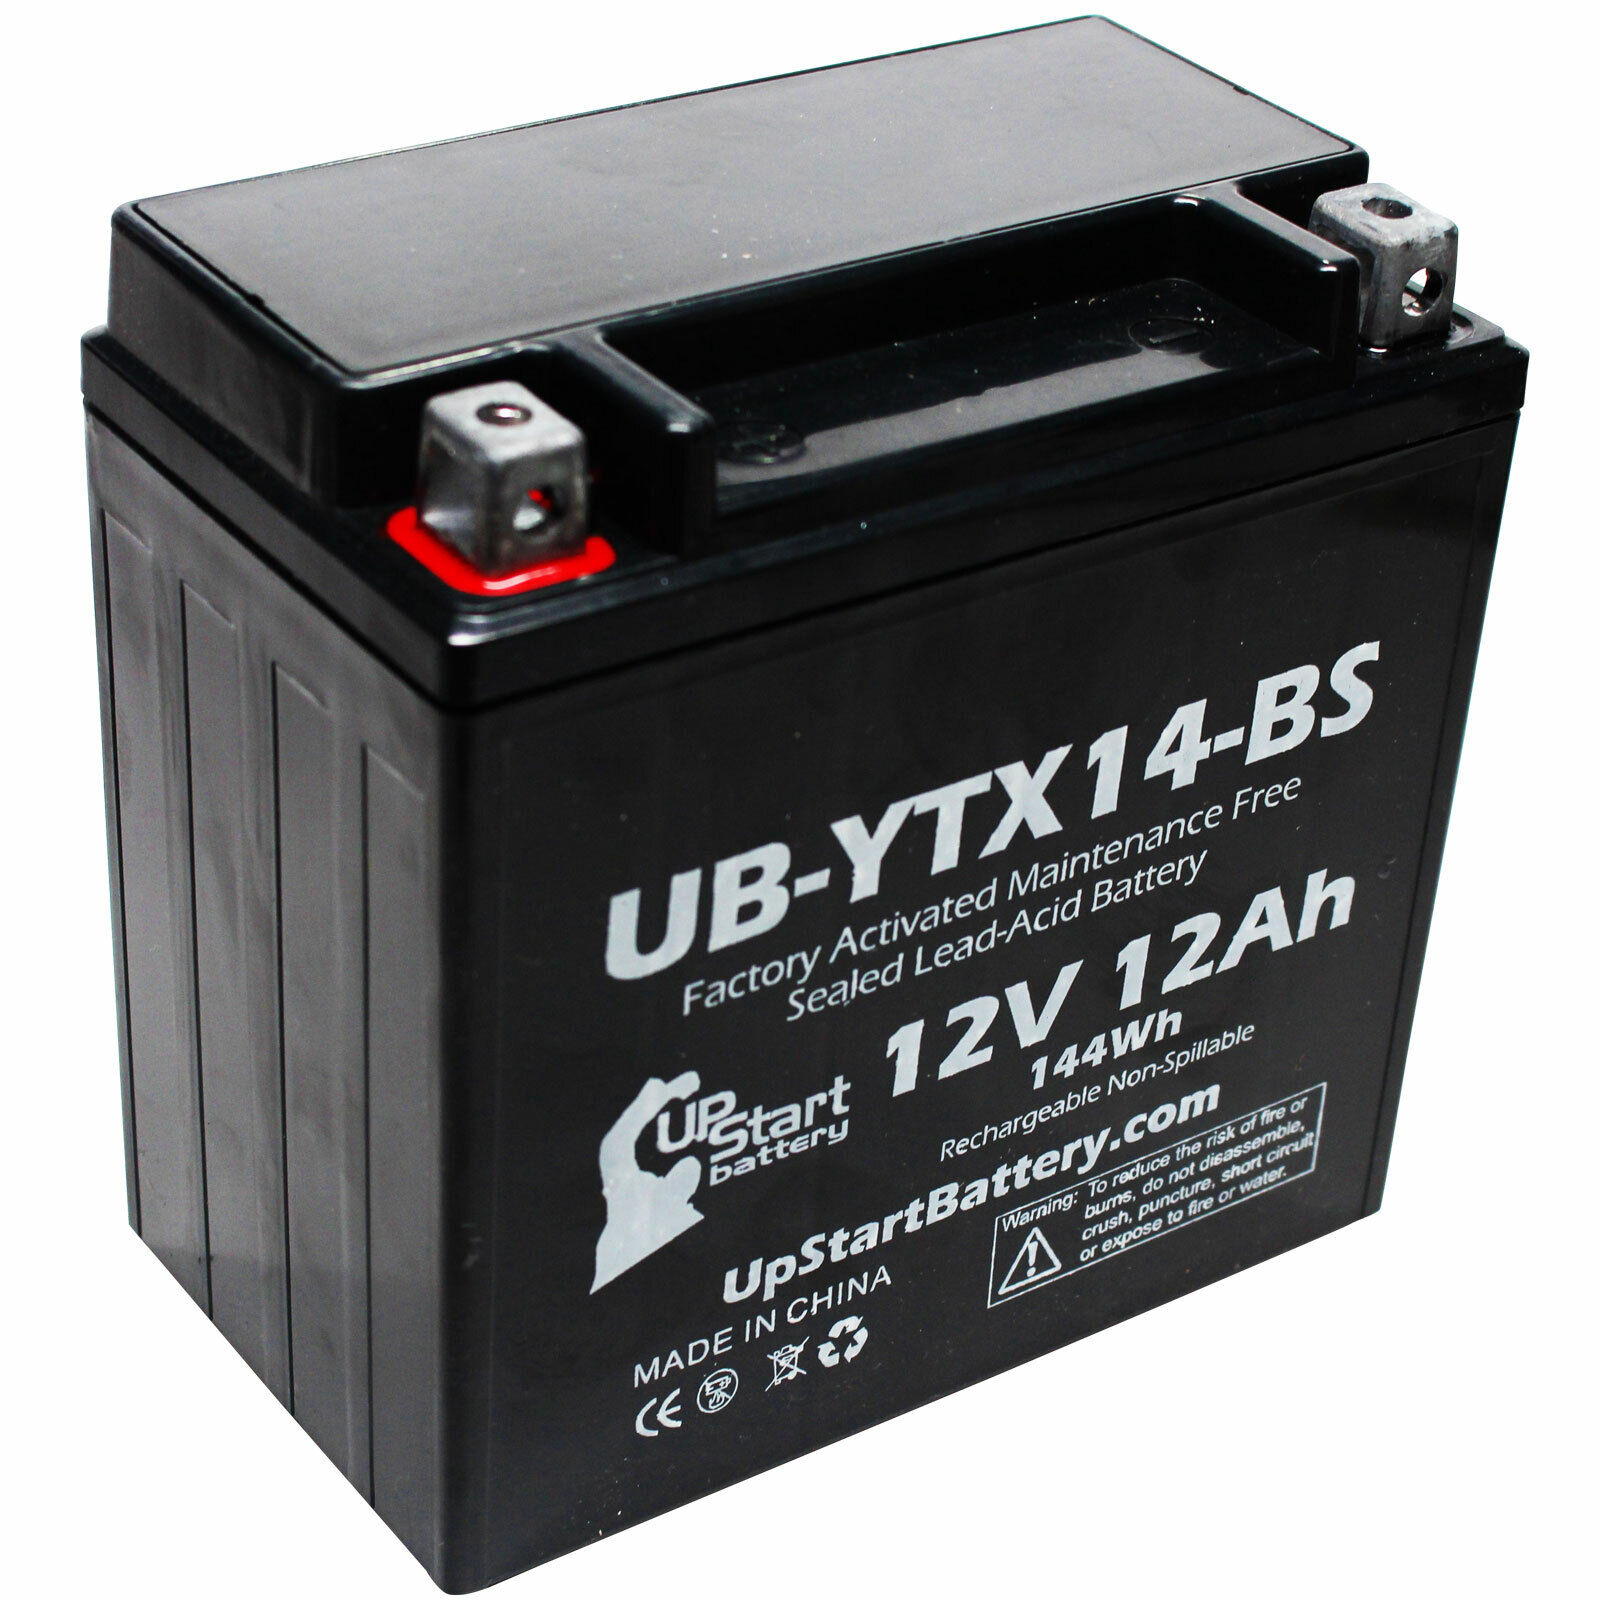 12V 12AH Battery for 1998 Honda TRX400FW Foreman 400 CC